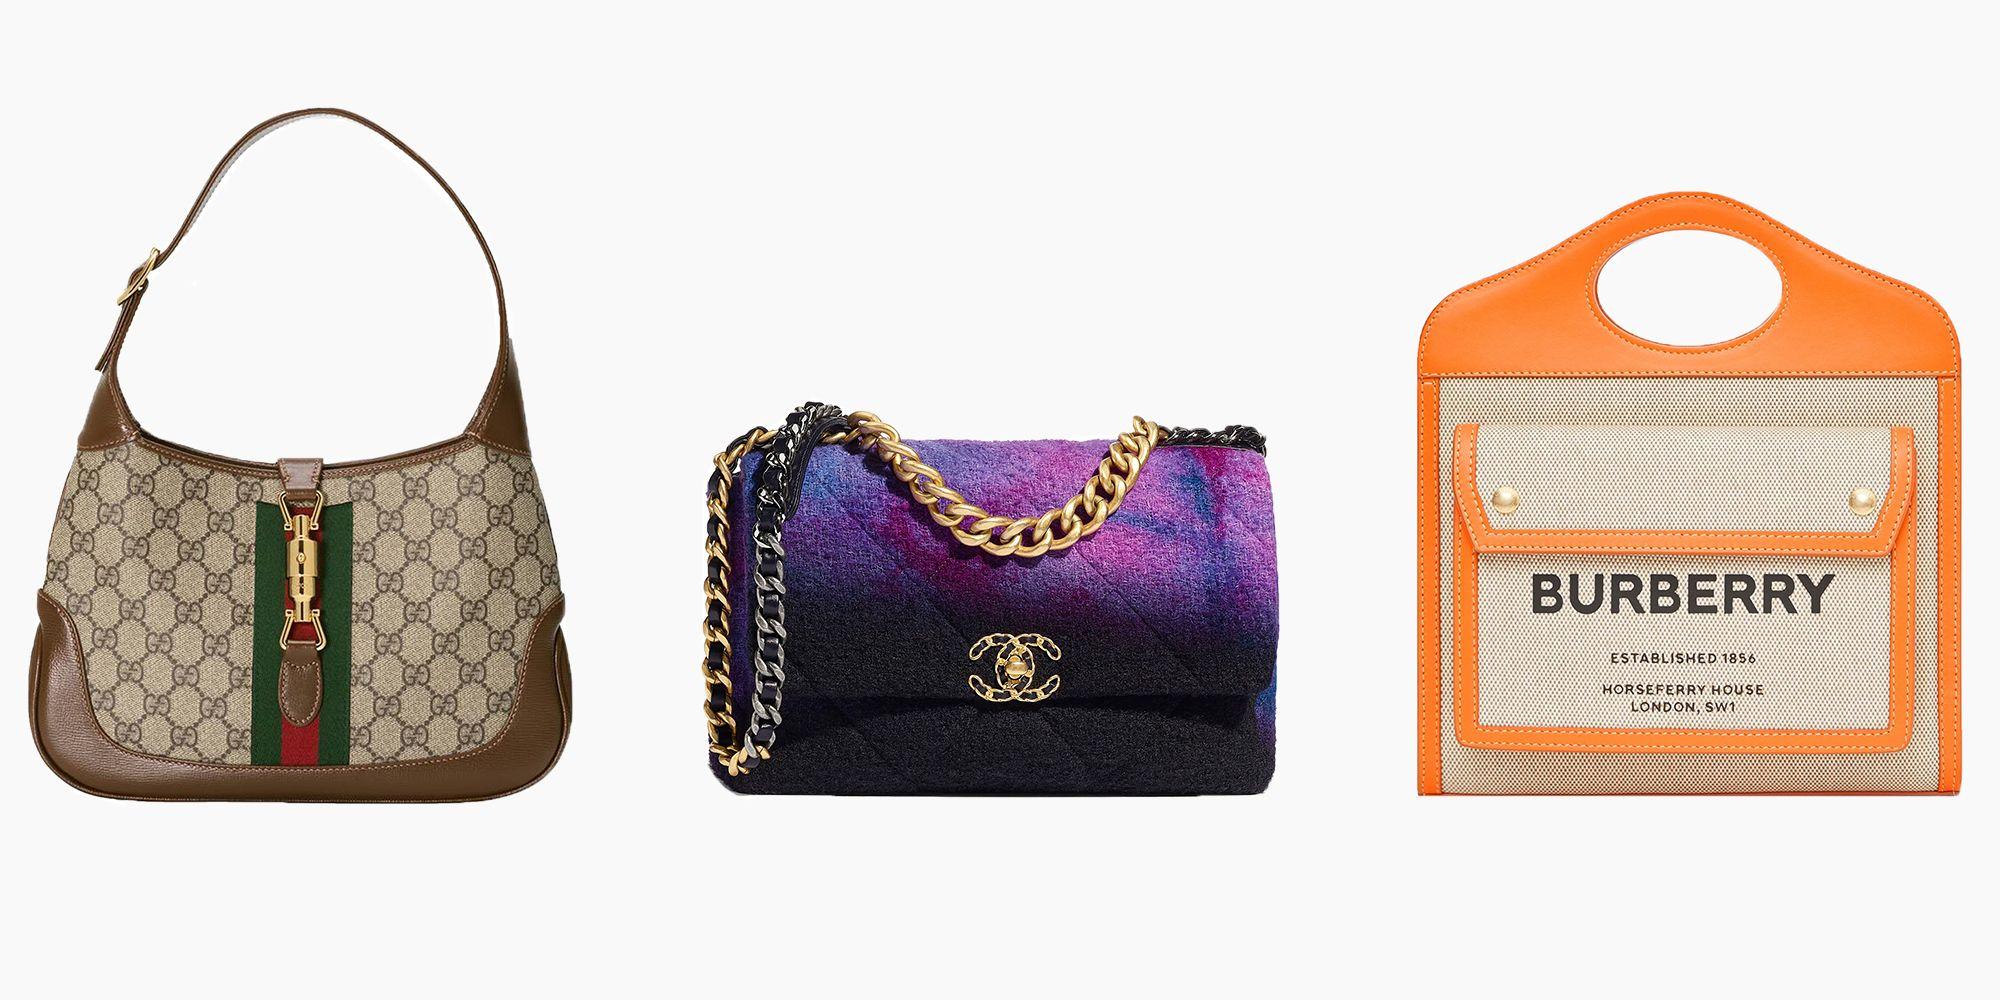 15 New Designer Handbags to Invest In Now